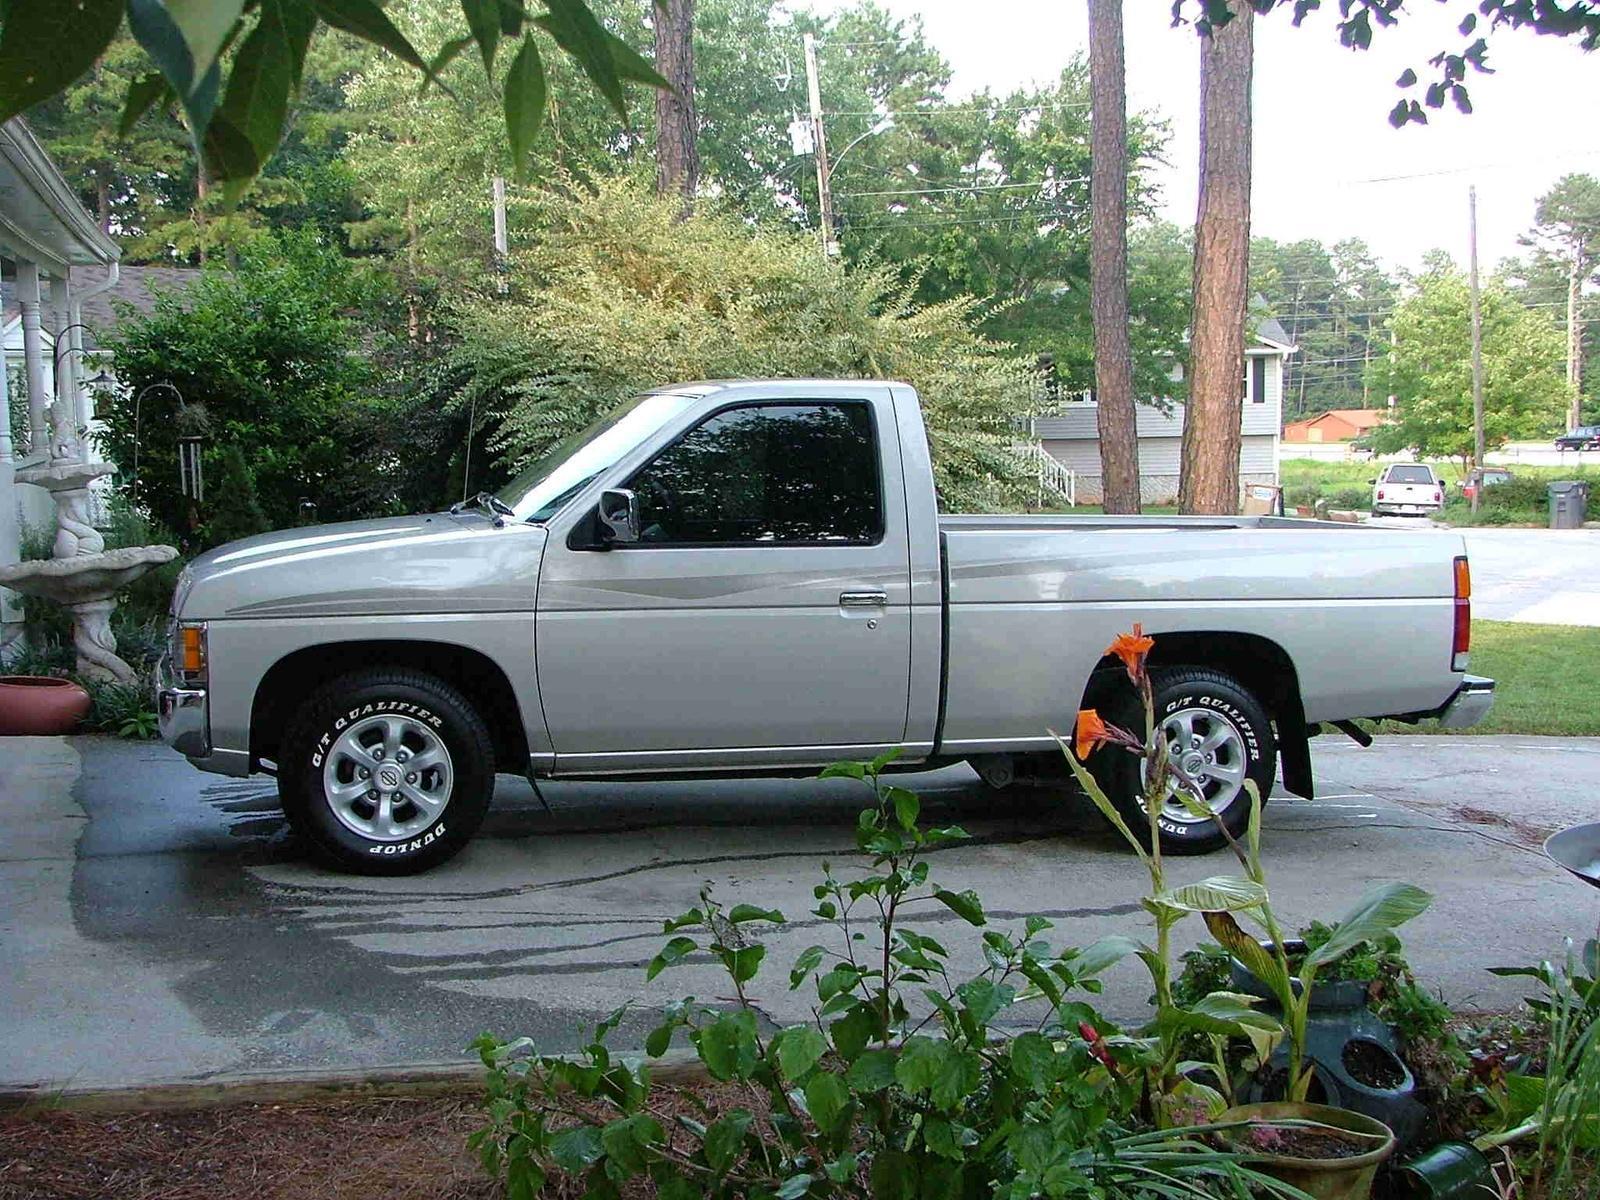 800 1024 1280 1600 origin 1997 Nissan Truck ...